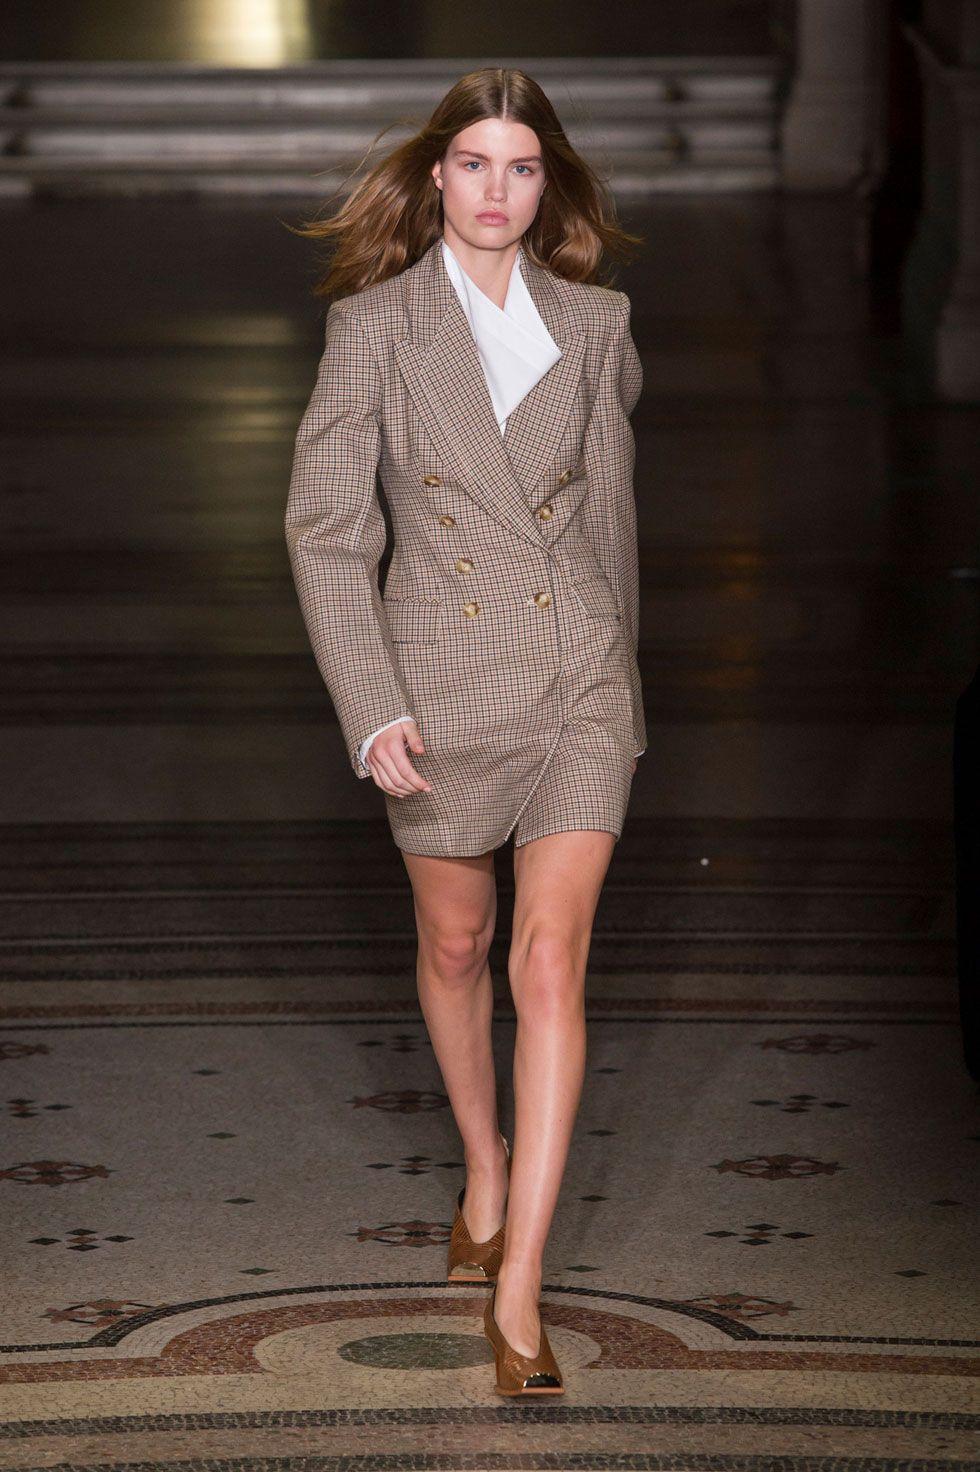 Paris_Fashion_Week-Fall_Winter_2015-Street_Style-PFW-Poppy